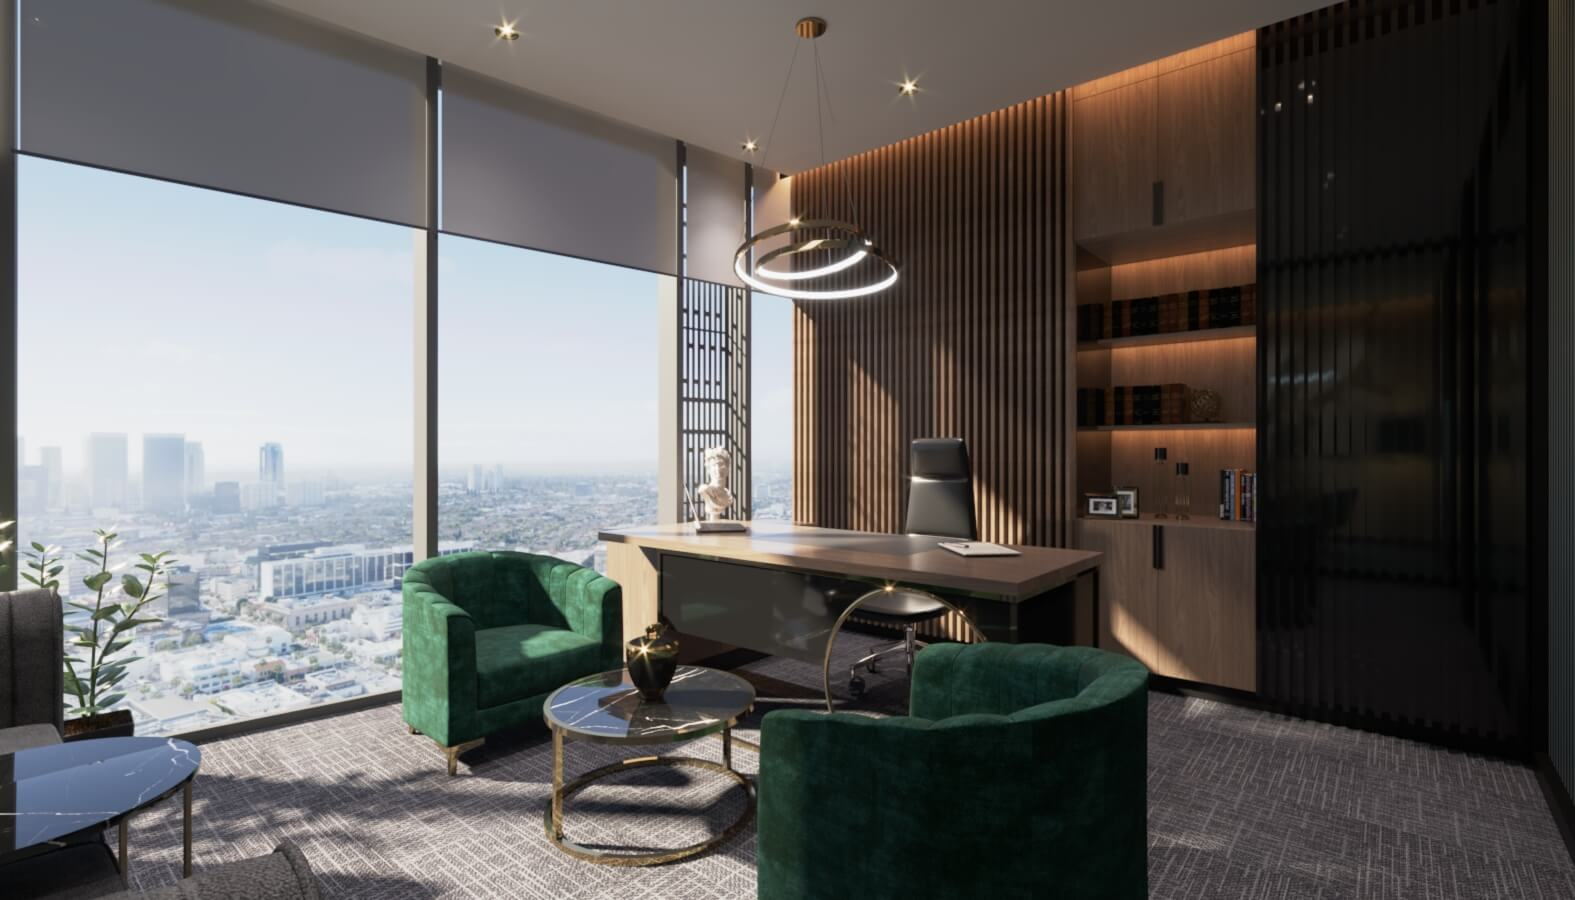 Hotel Architecture and Interior Design Sumeyye Eroglu Guzel Law Office